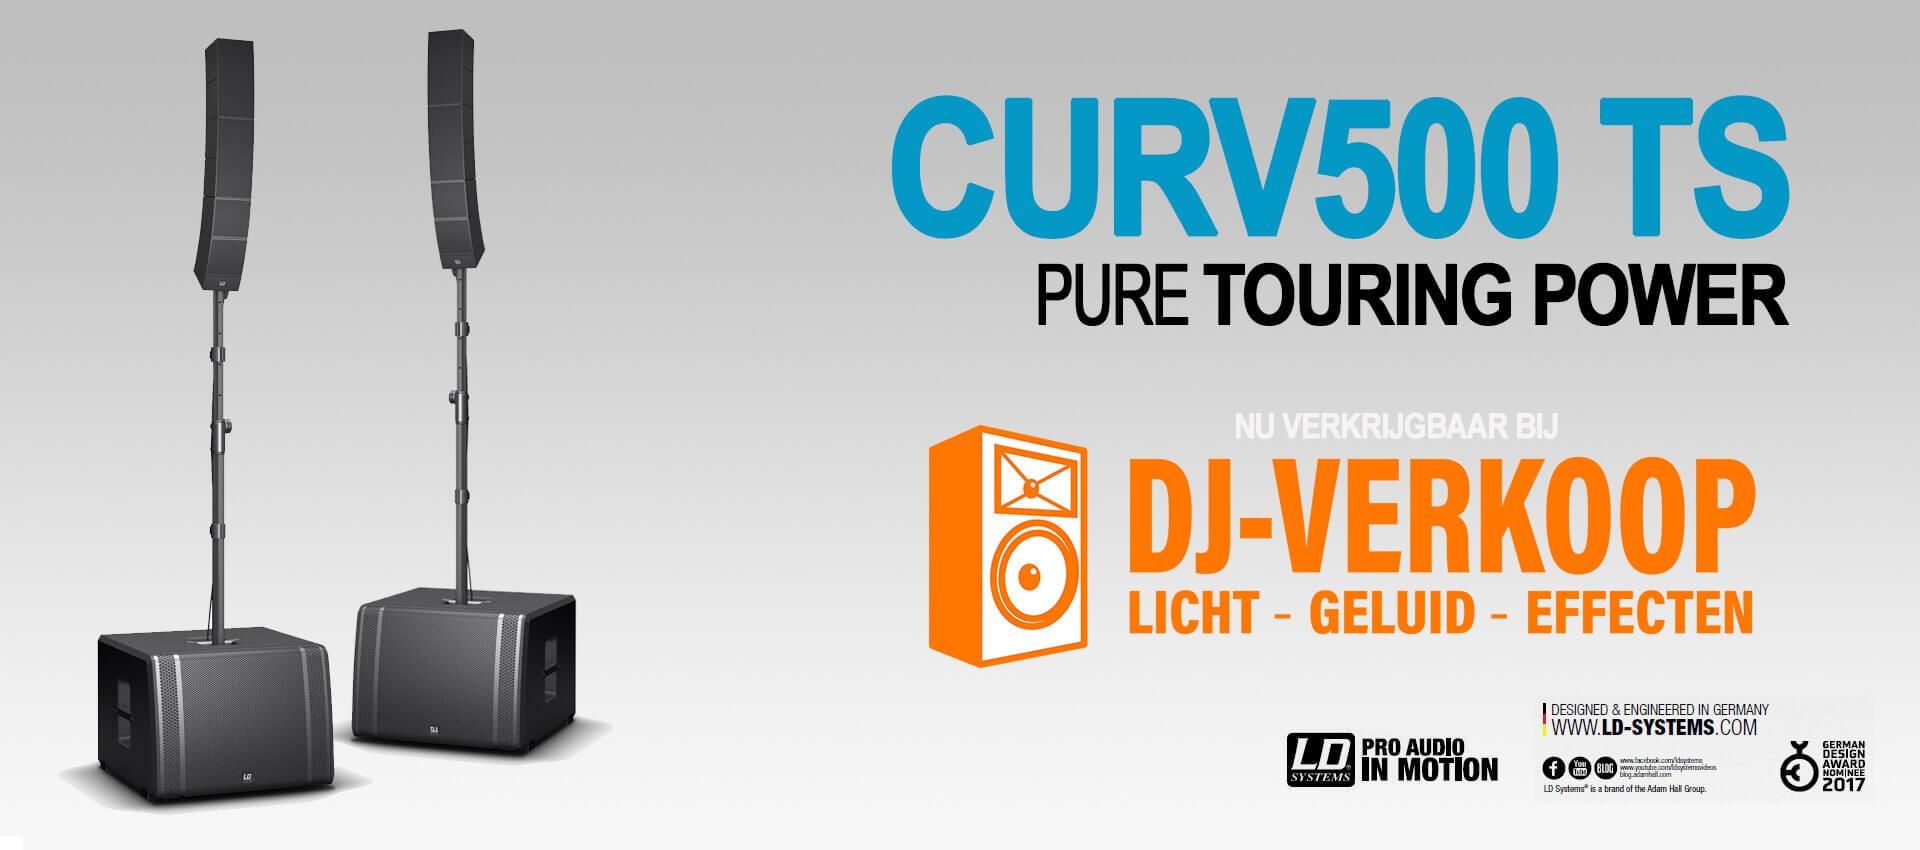 LD Systems CURV500 TS nu verkrijgbaar bij DJ-Verkoop.nl